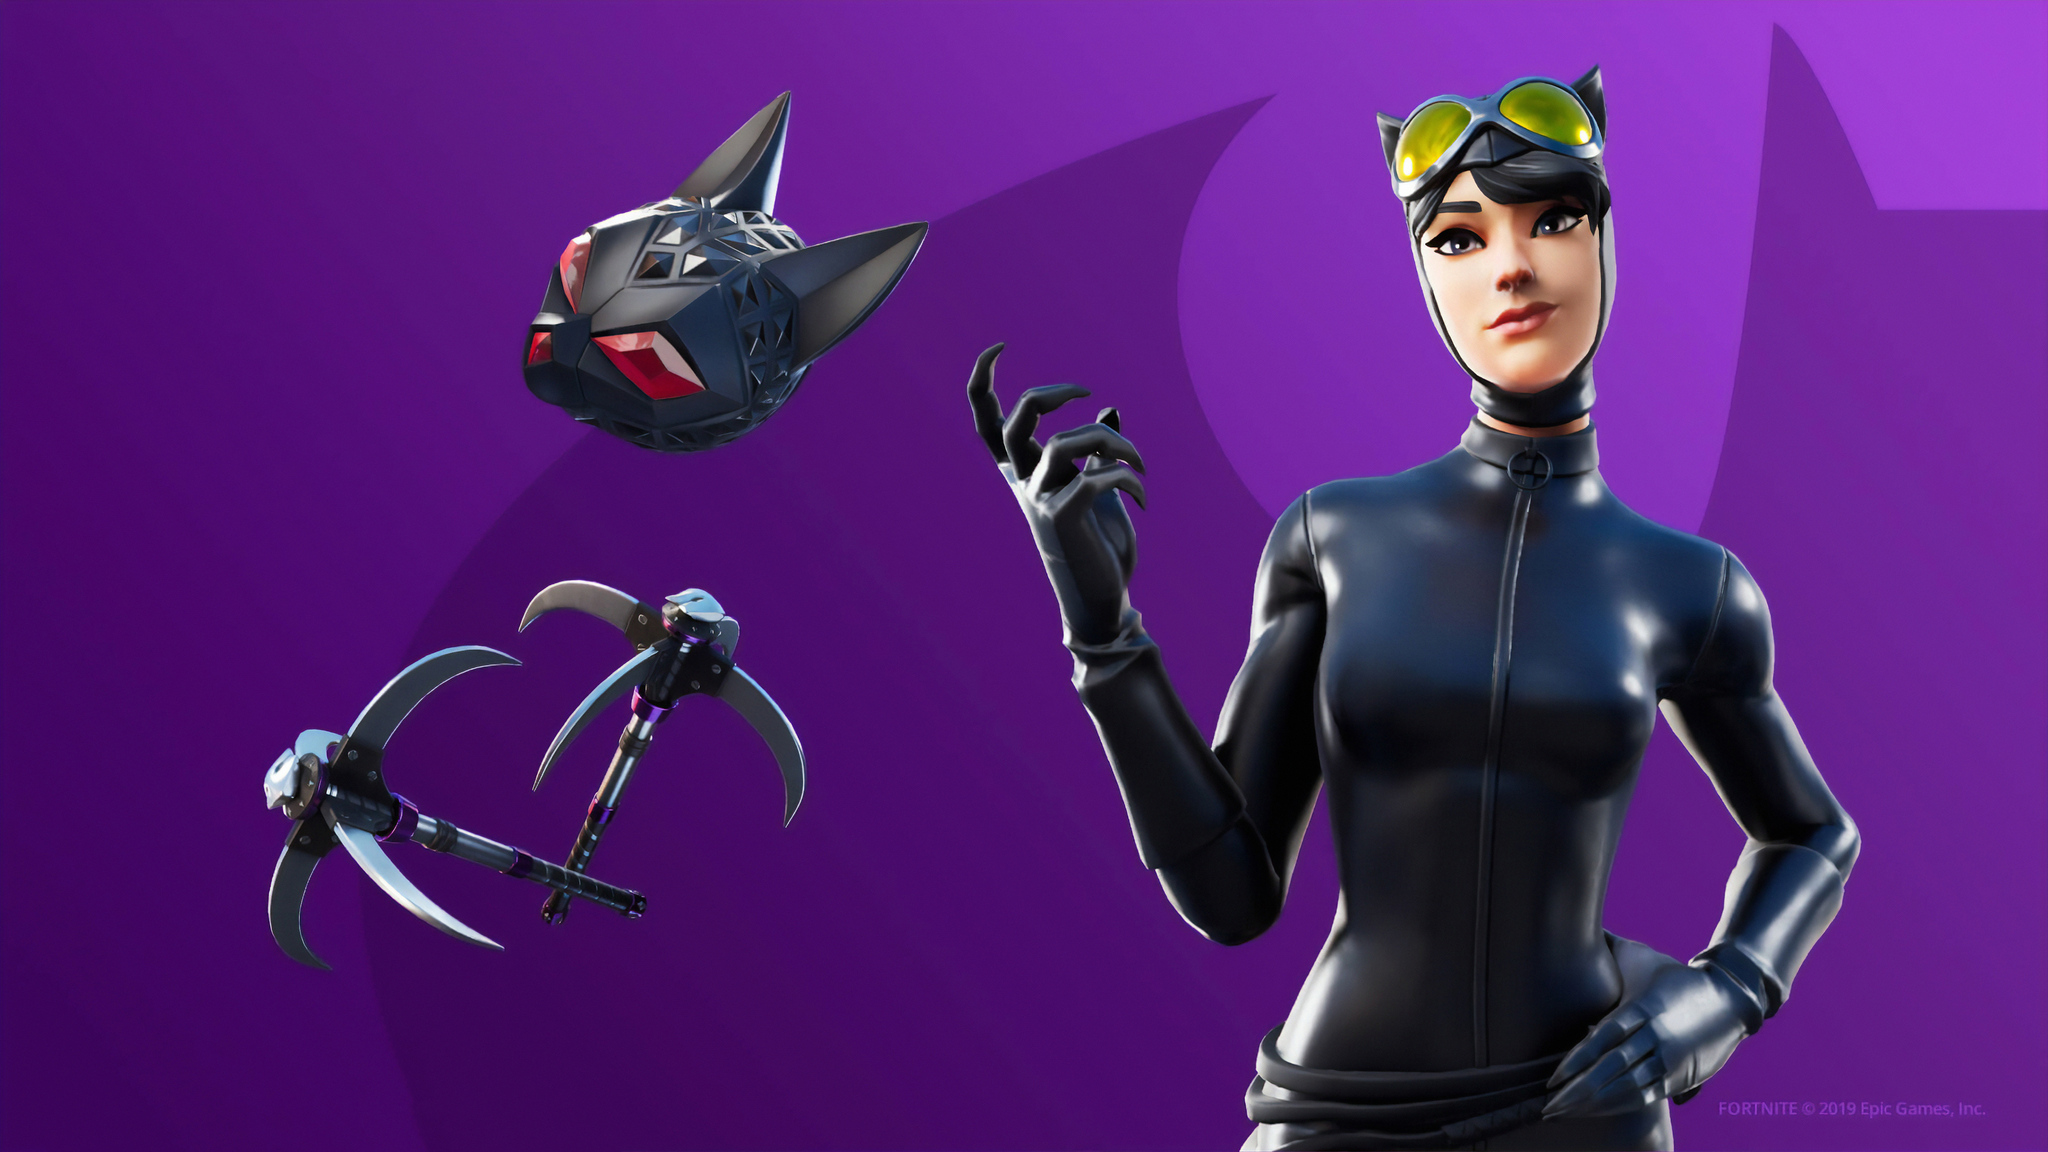 2048x1152 Catwoman Fortnite 2048x1152 Resolution Hd 4k